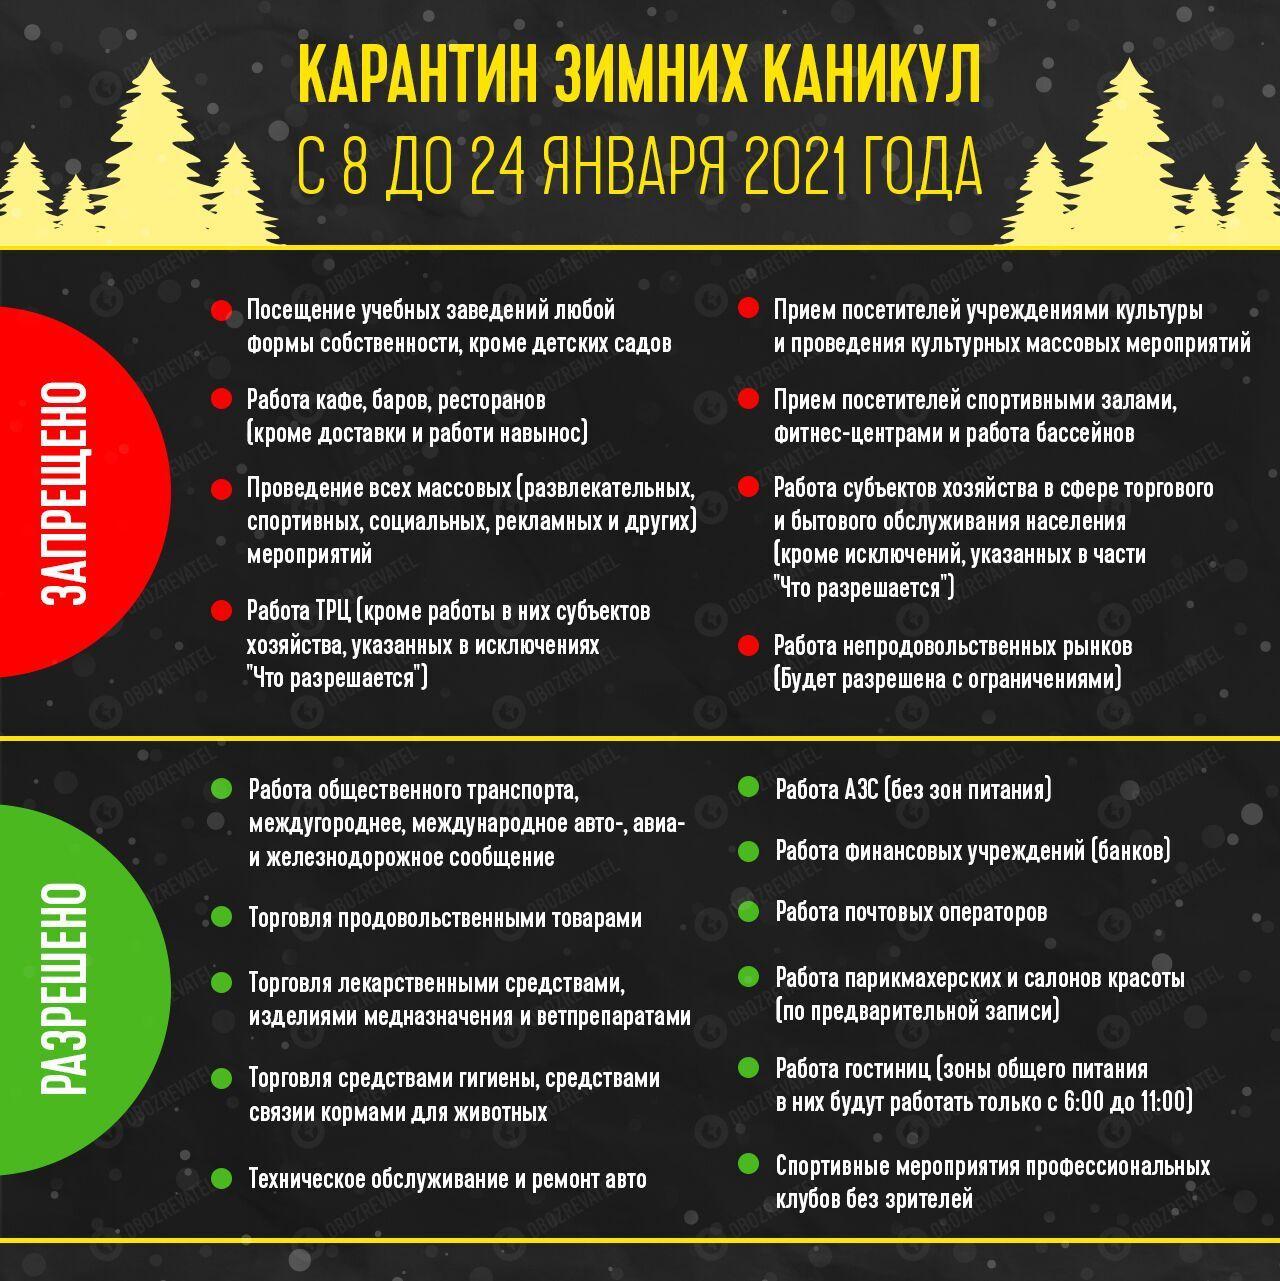 Карантин зимних каникул в Украине